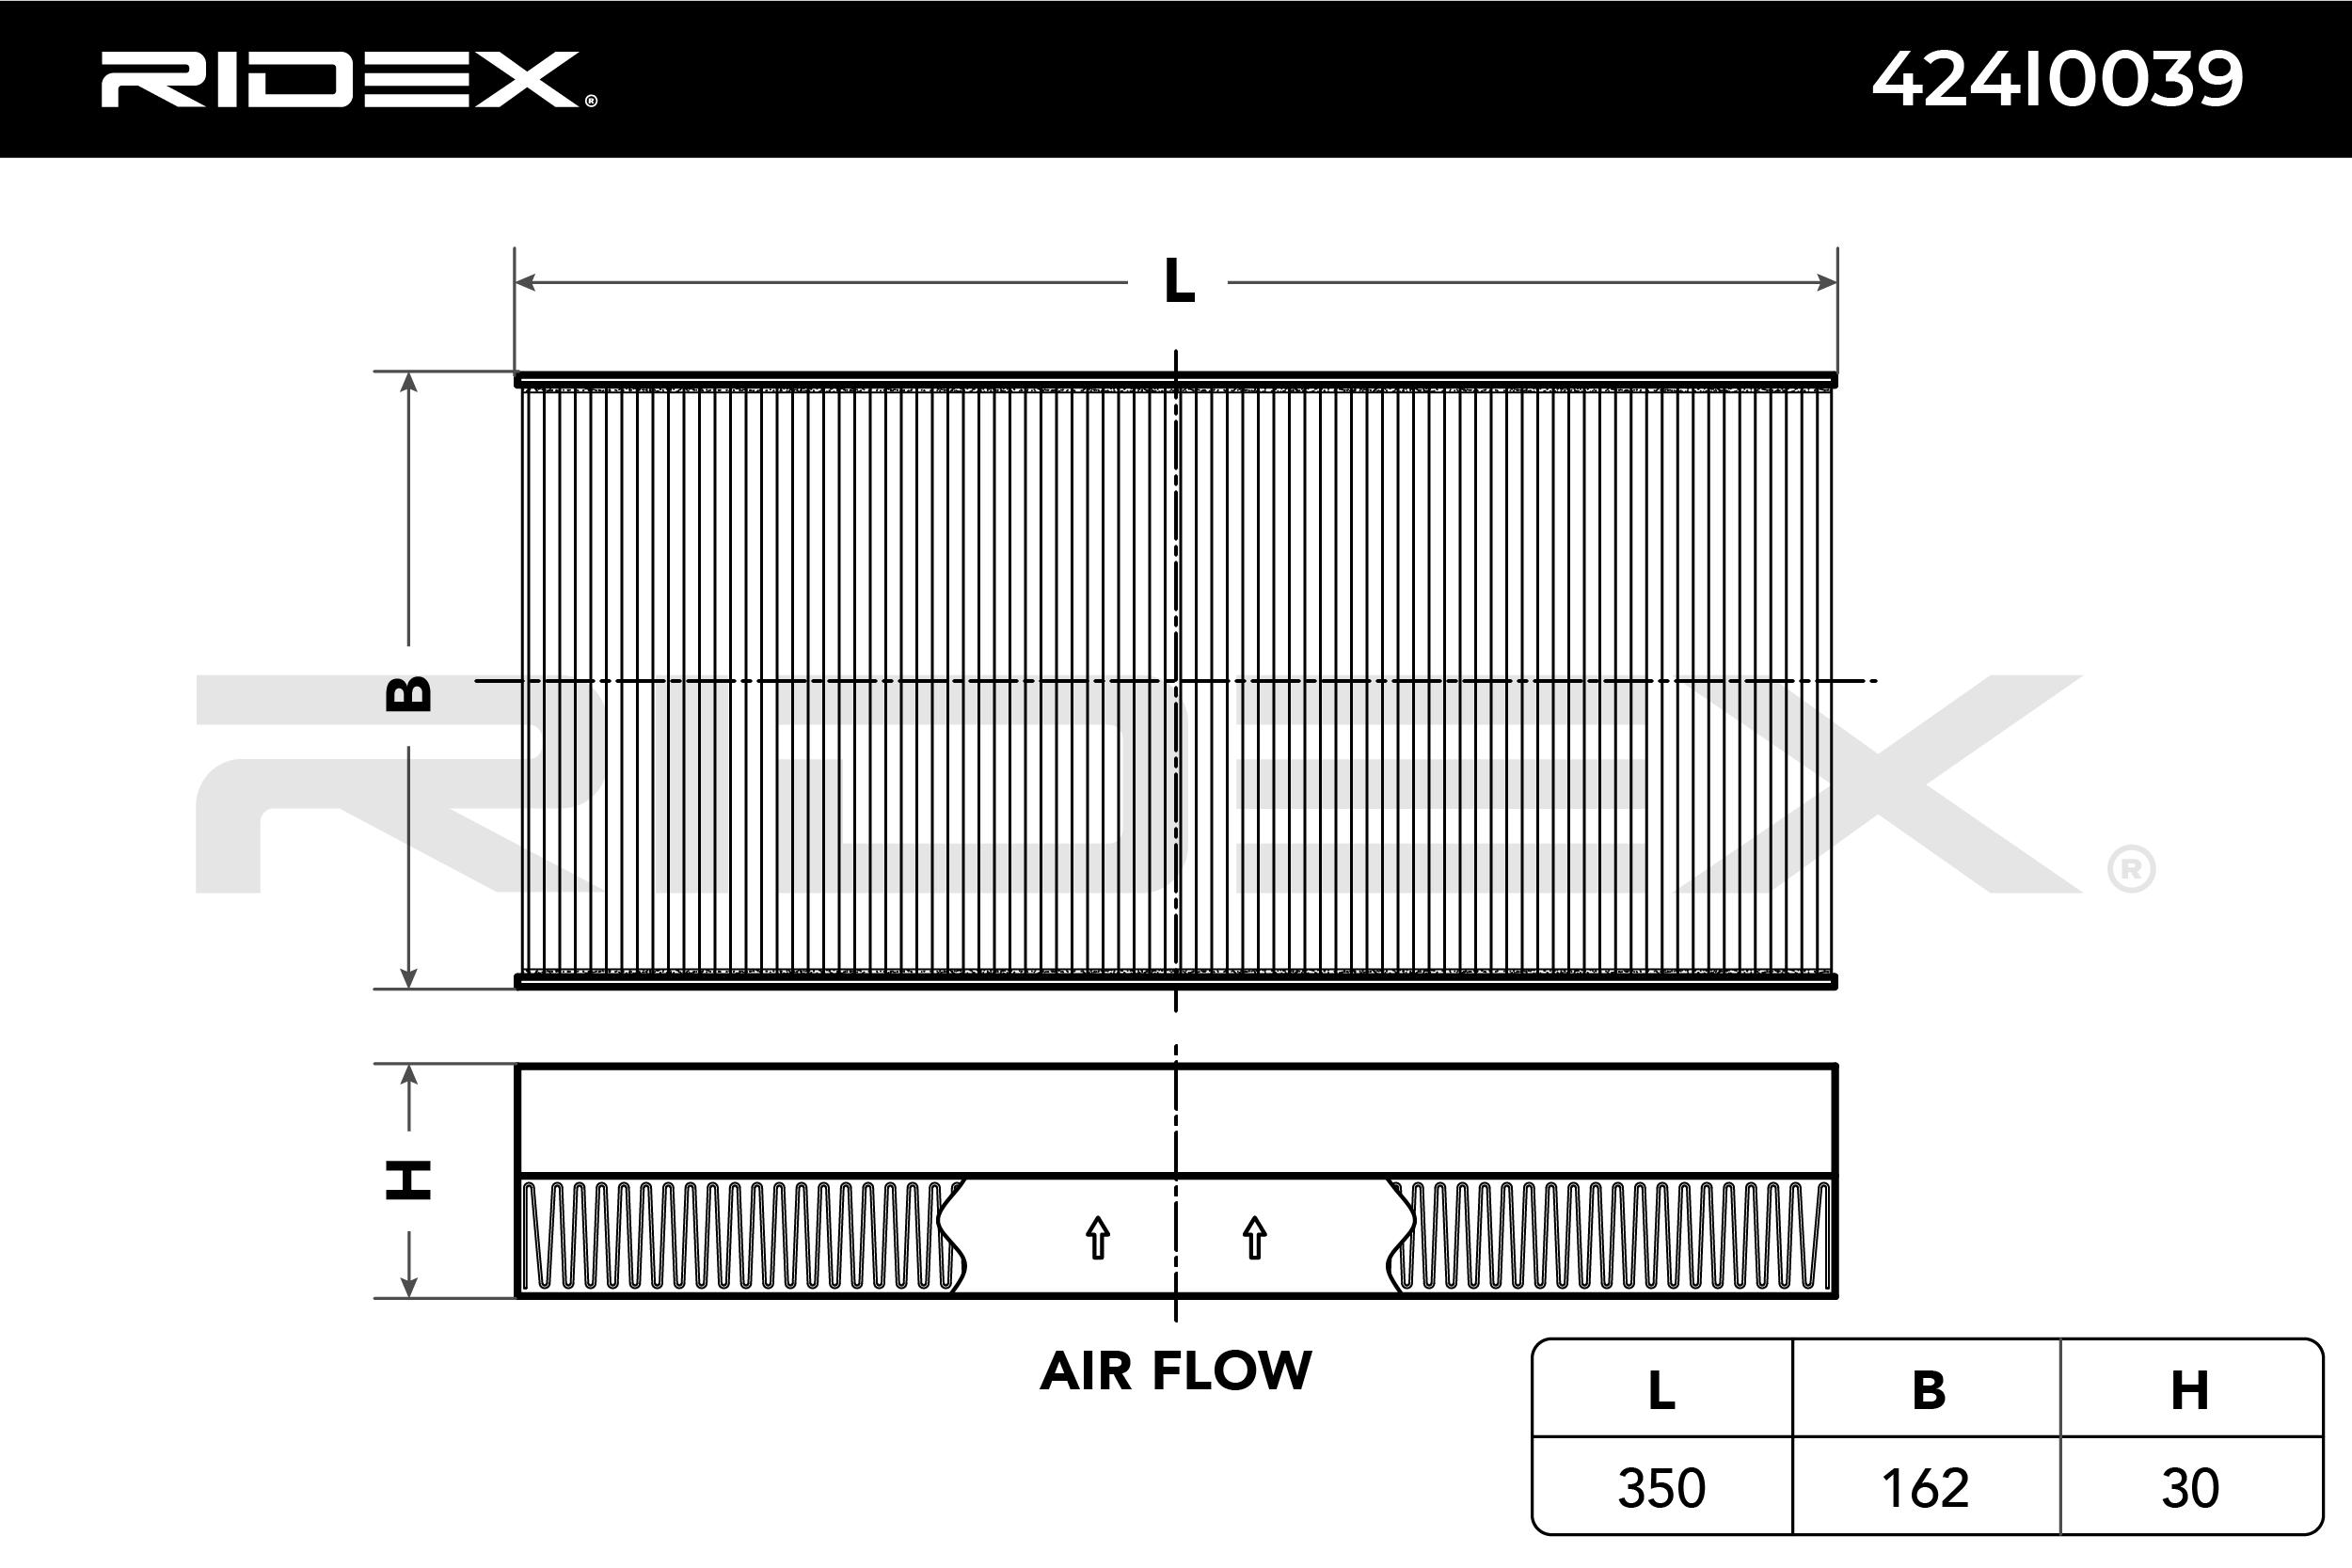 Innenraumfilter 424I0039 RIDEX 424I0039 in Original Qualität